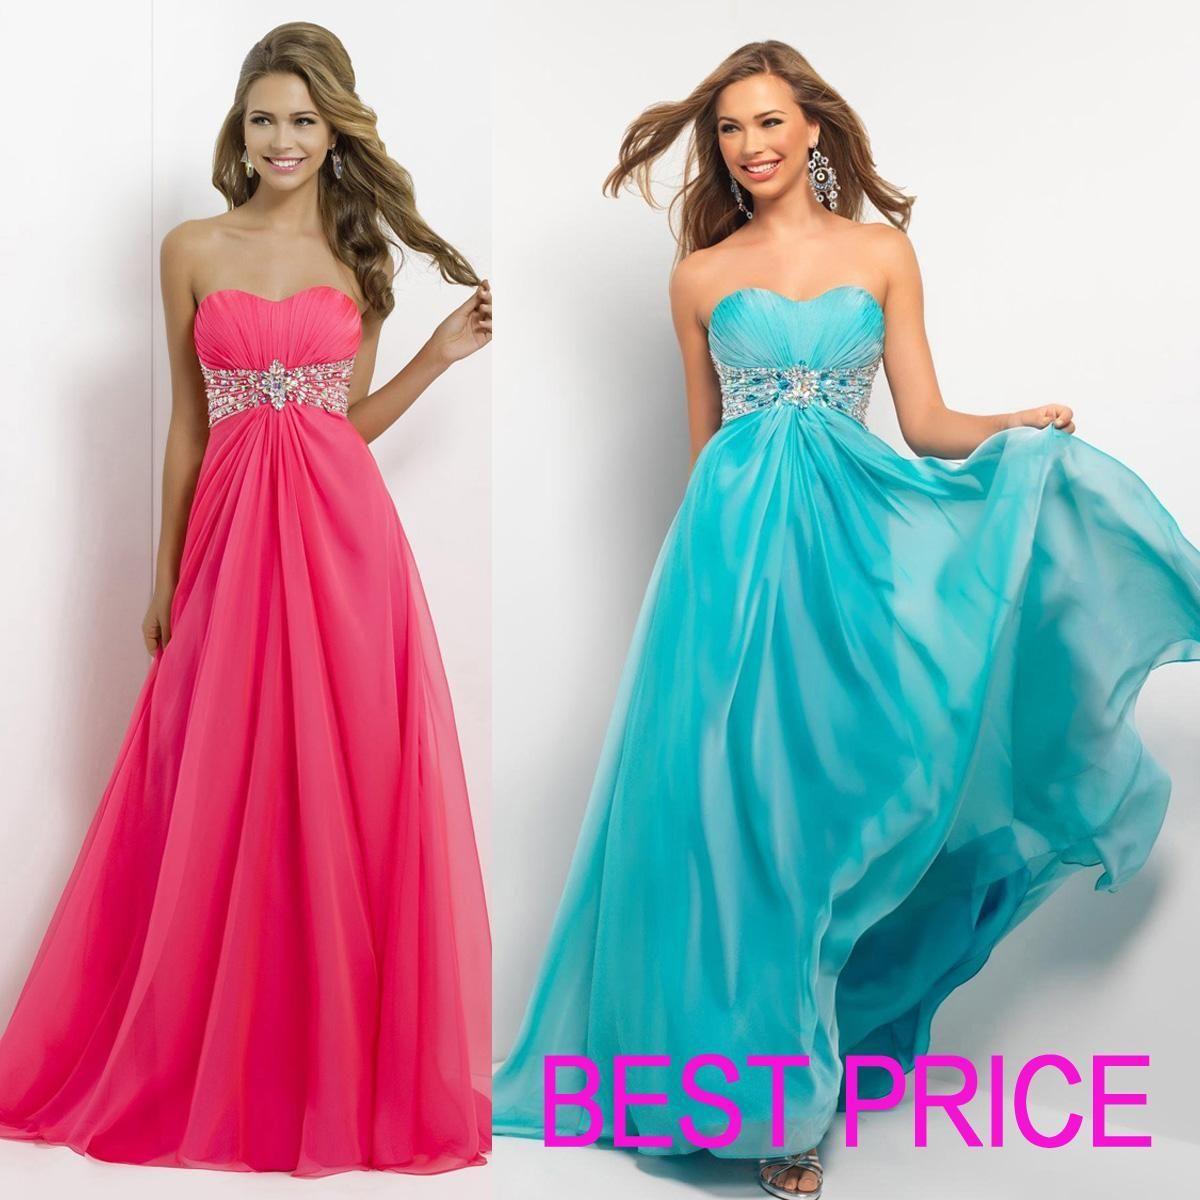 New Prom Dresses Sweetheart Chiffon Beads Red Yellow Blue